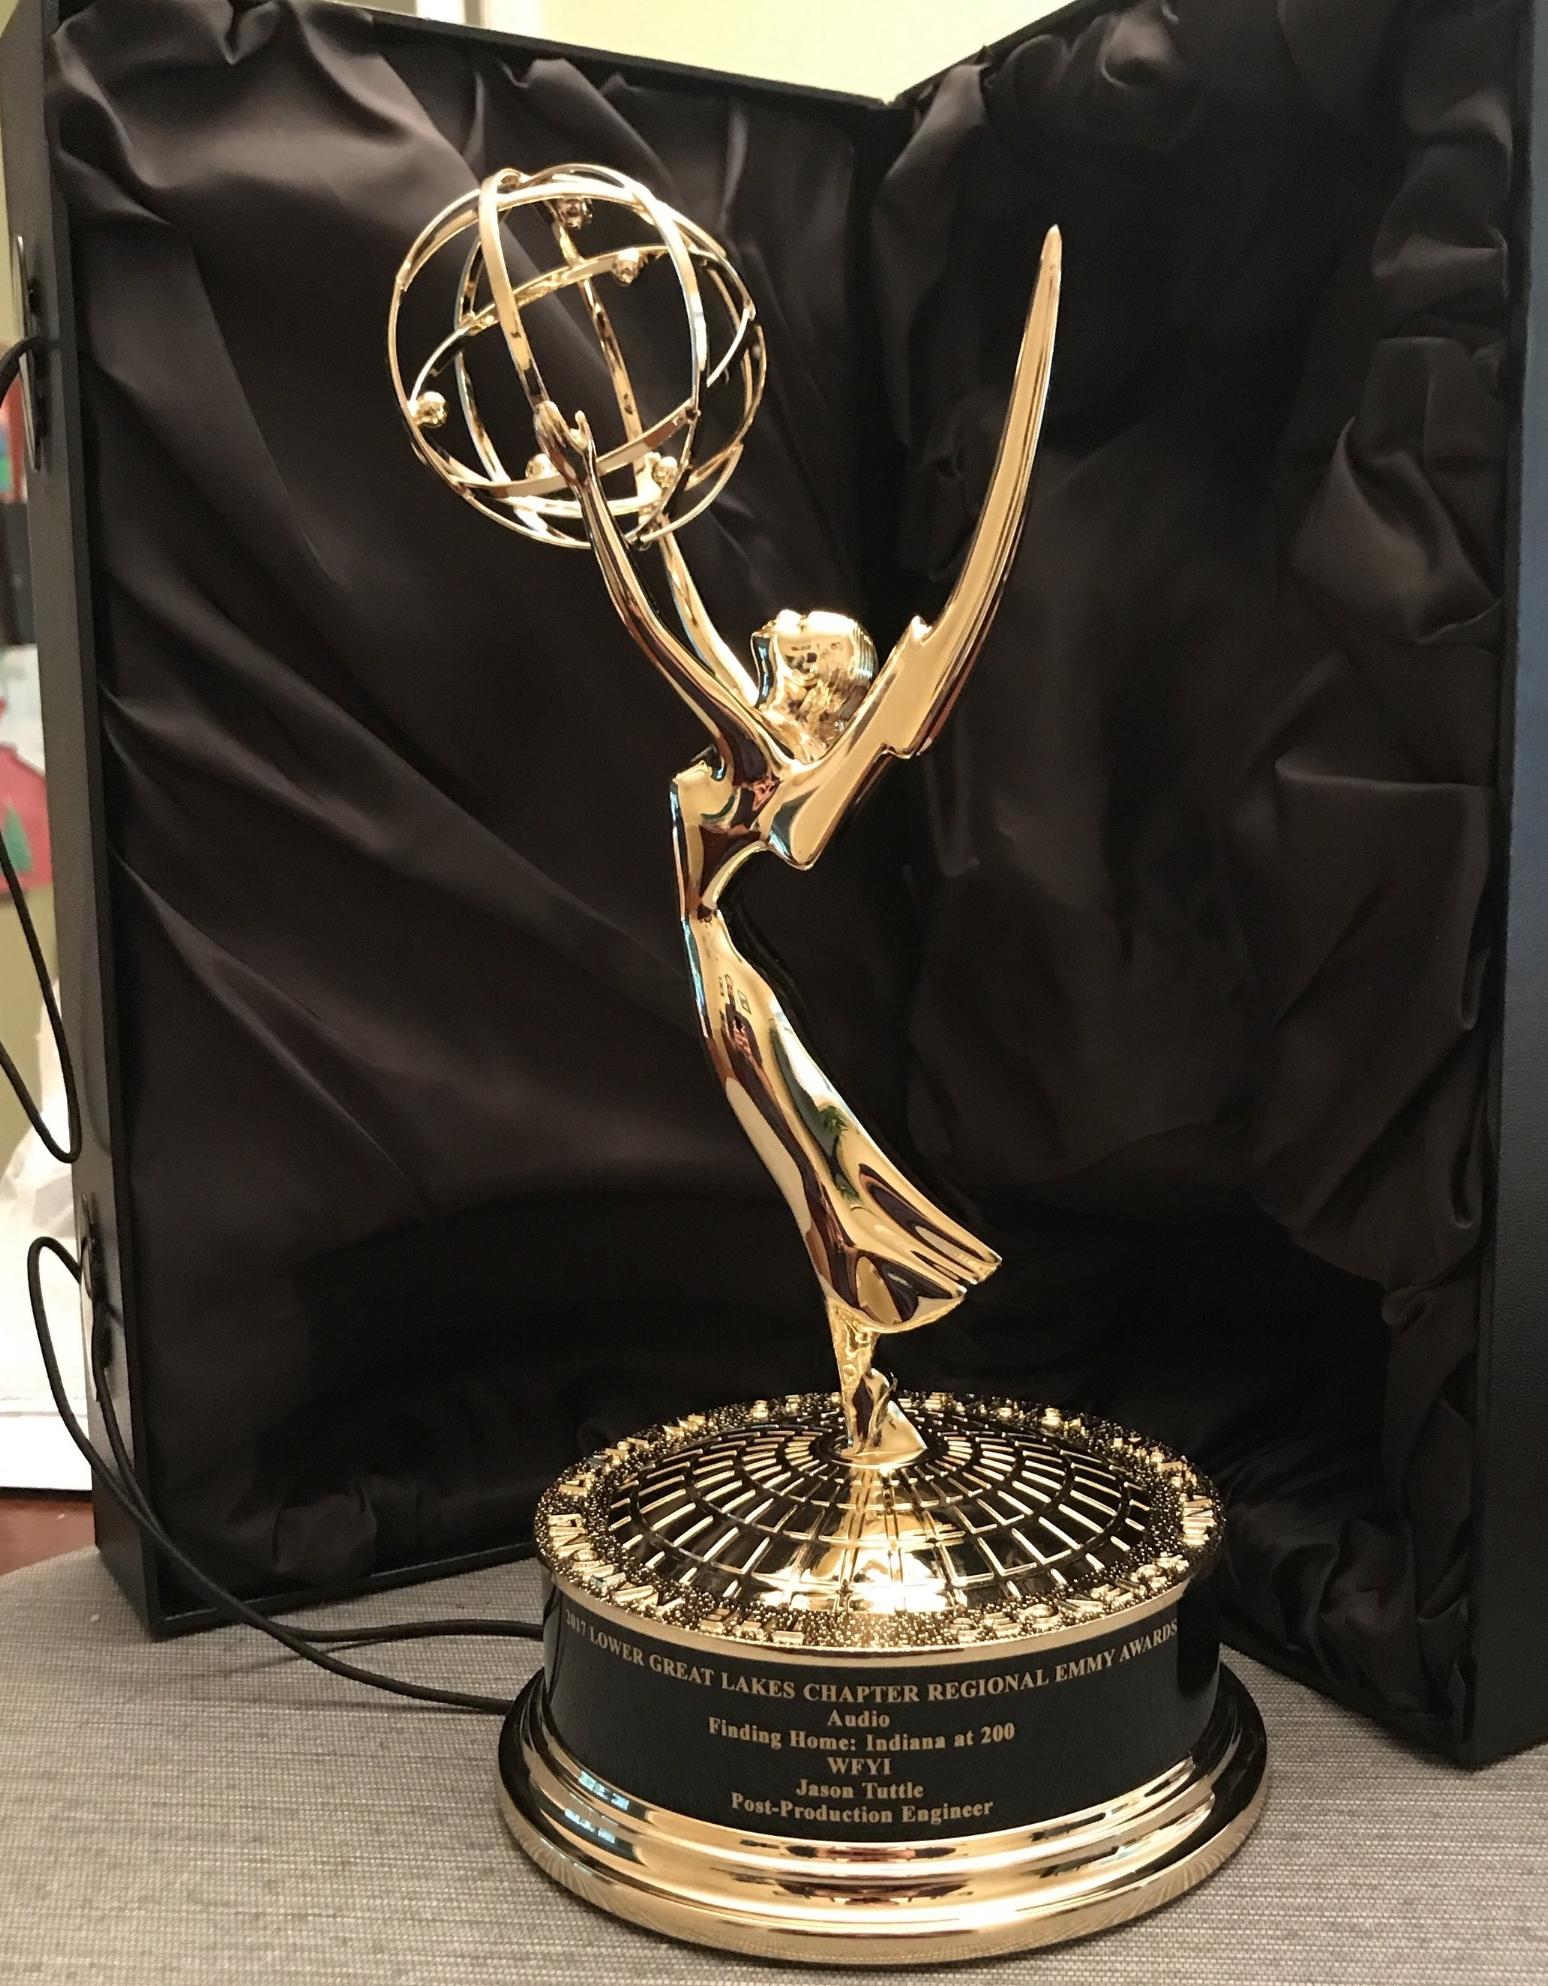 WAT? - A real-live Emmy award!